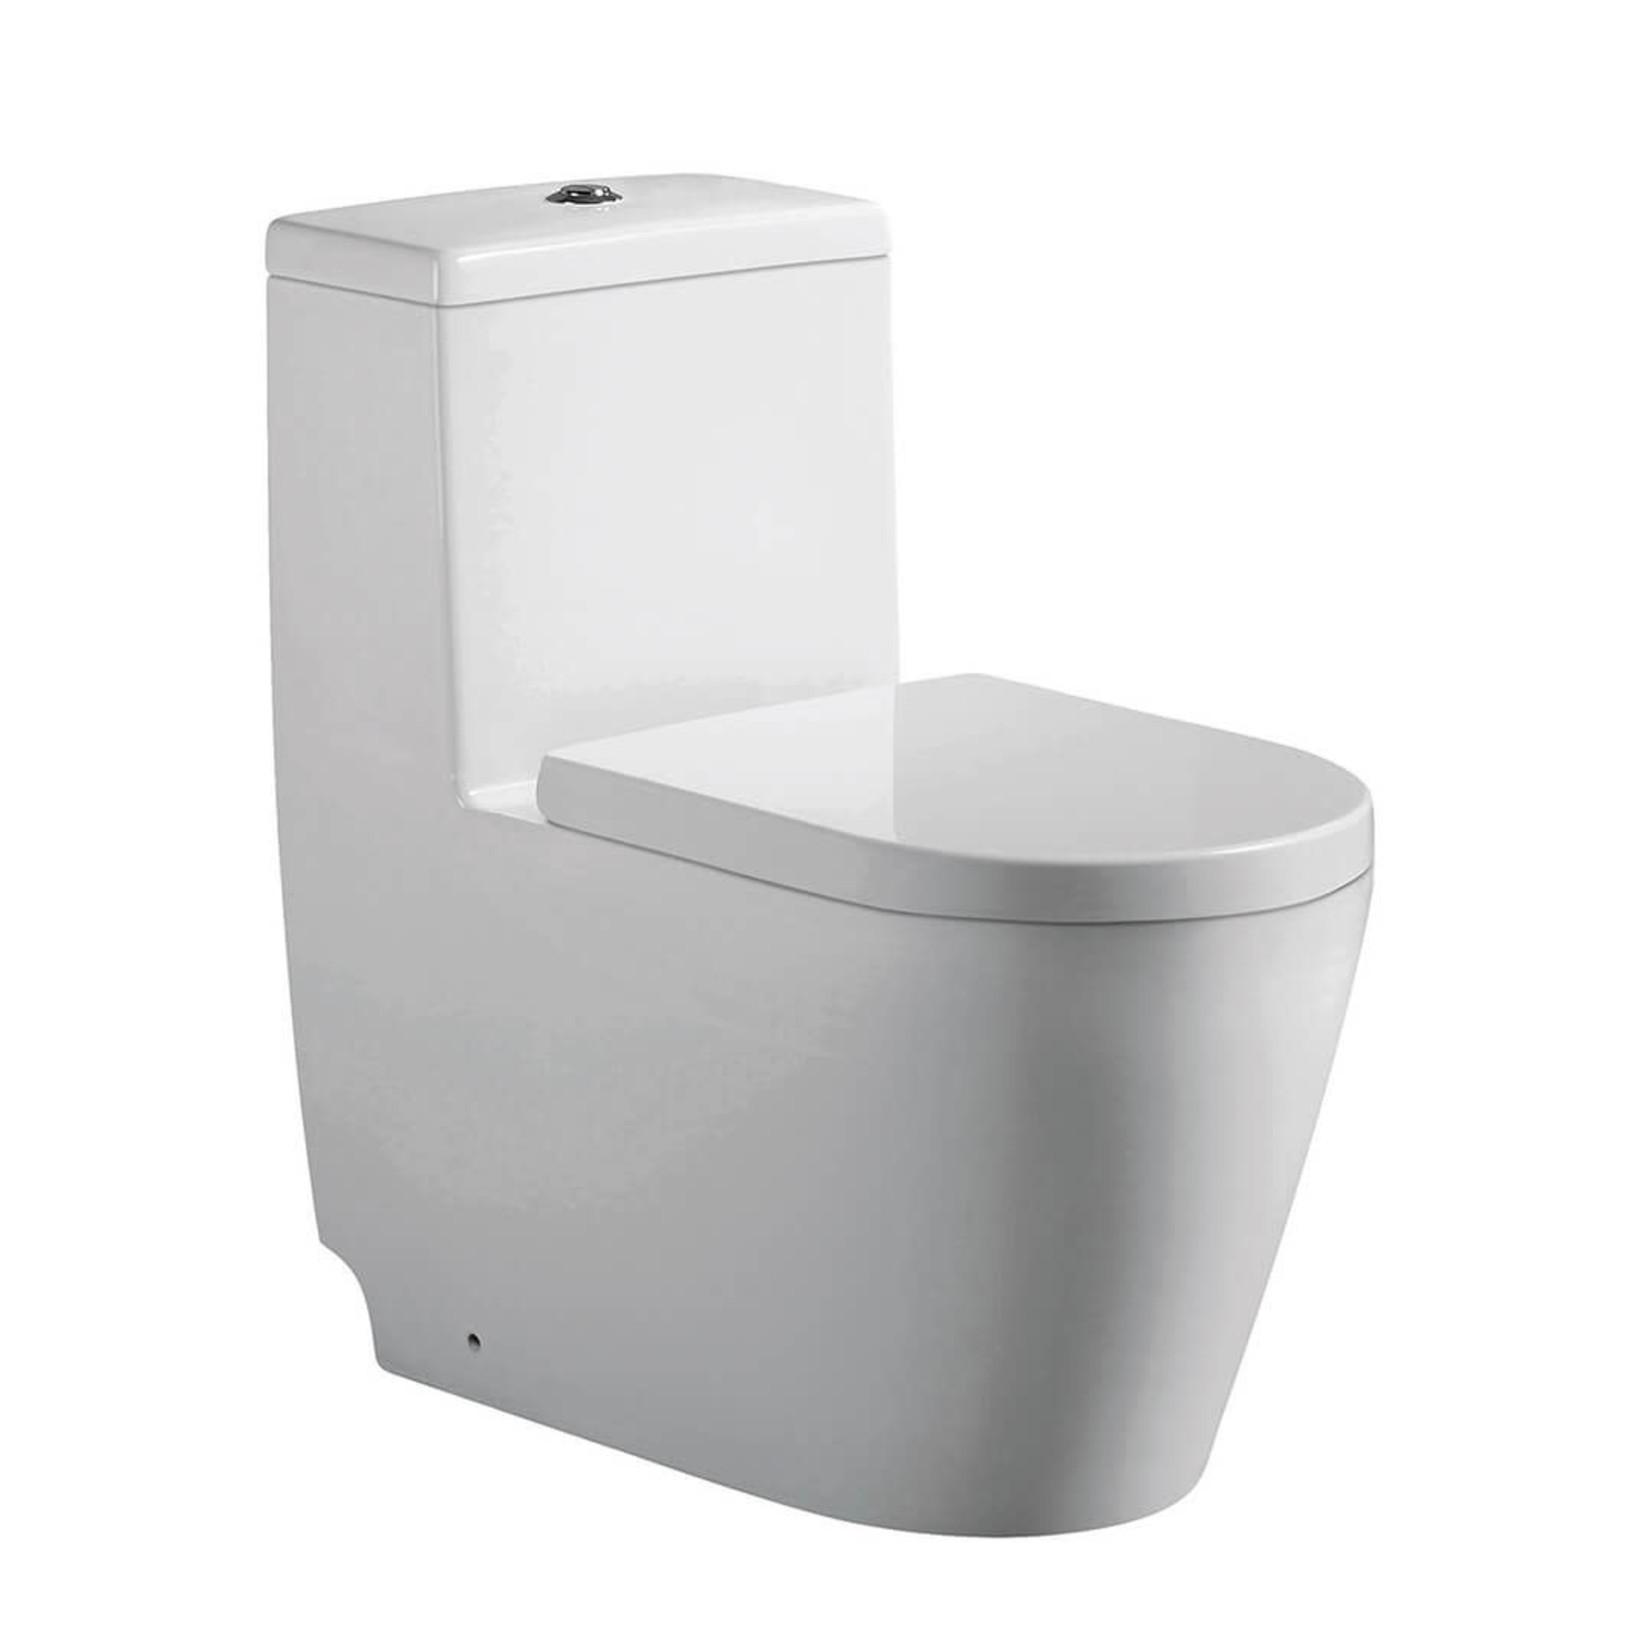 Giselle One-Piece Toilet